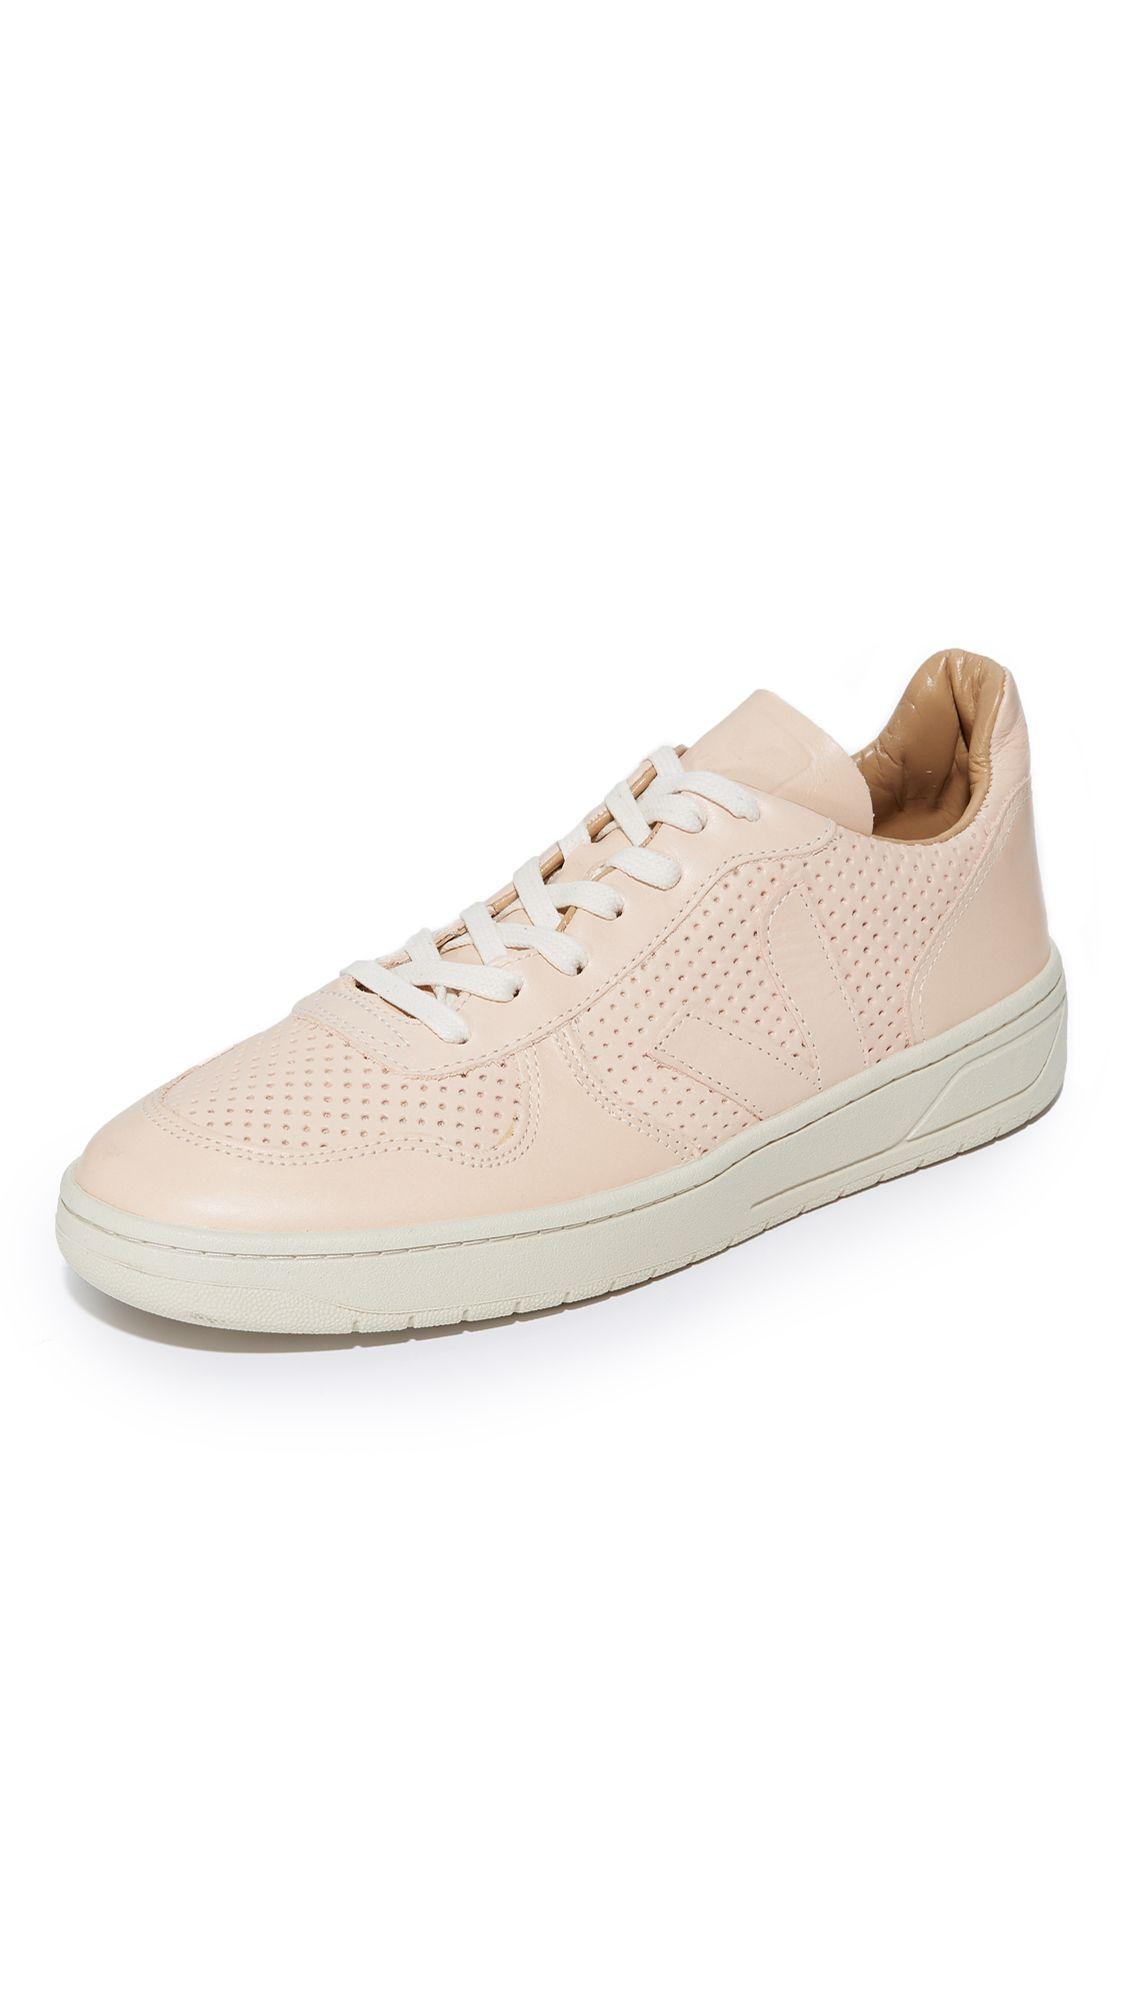 V-10 Bastille Leather SneakerVeja hhj5MNgL0